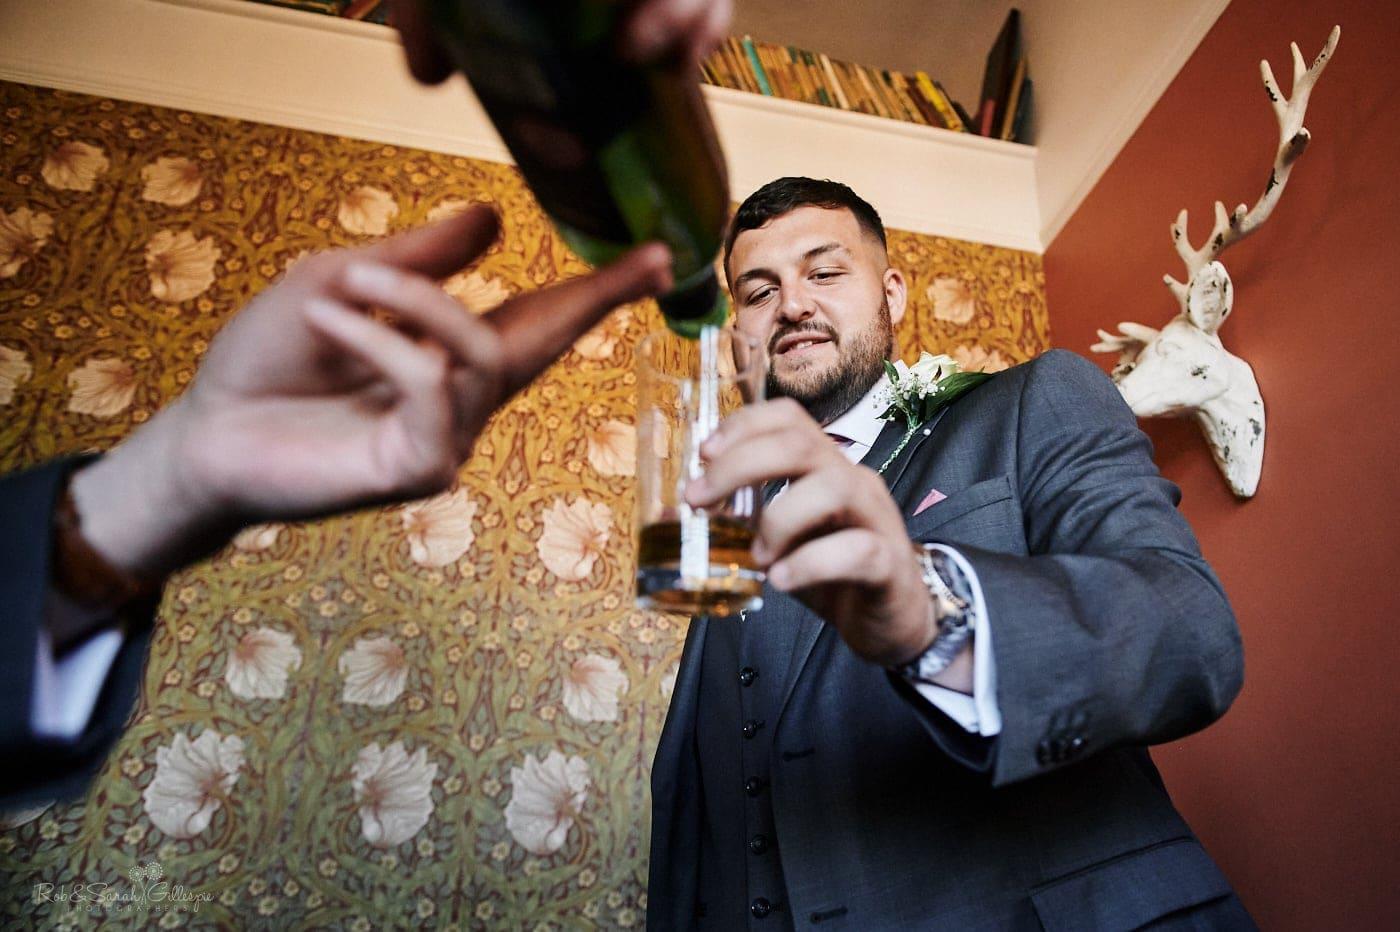 Groosman has drink poured as her prepares for wedding